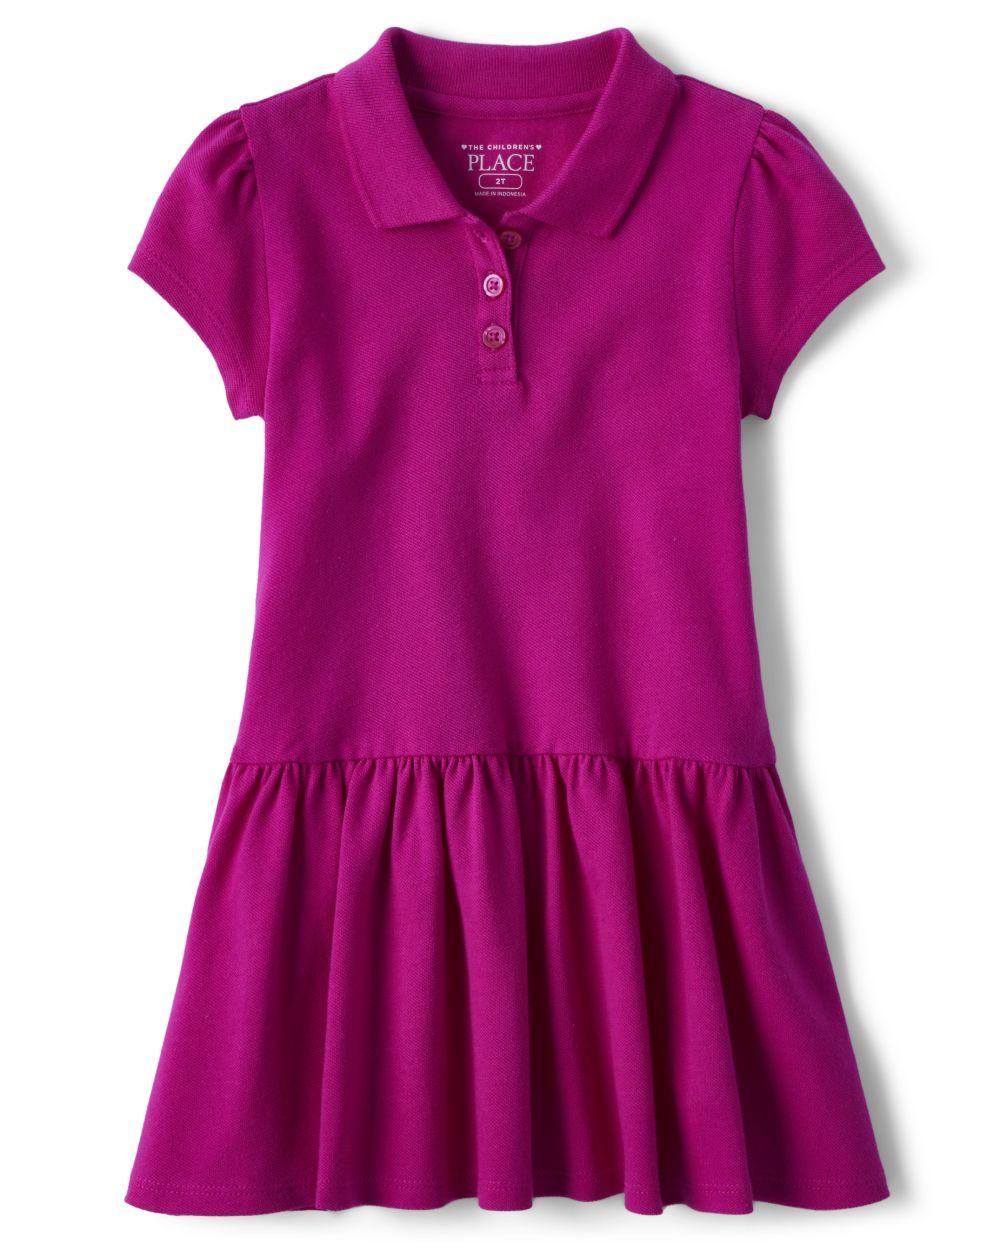 Toddler Girls Uniform Ruffle Pique Polo Dress